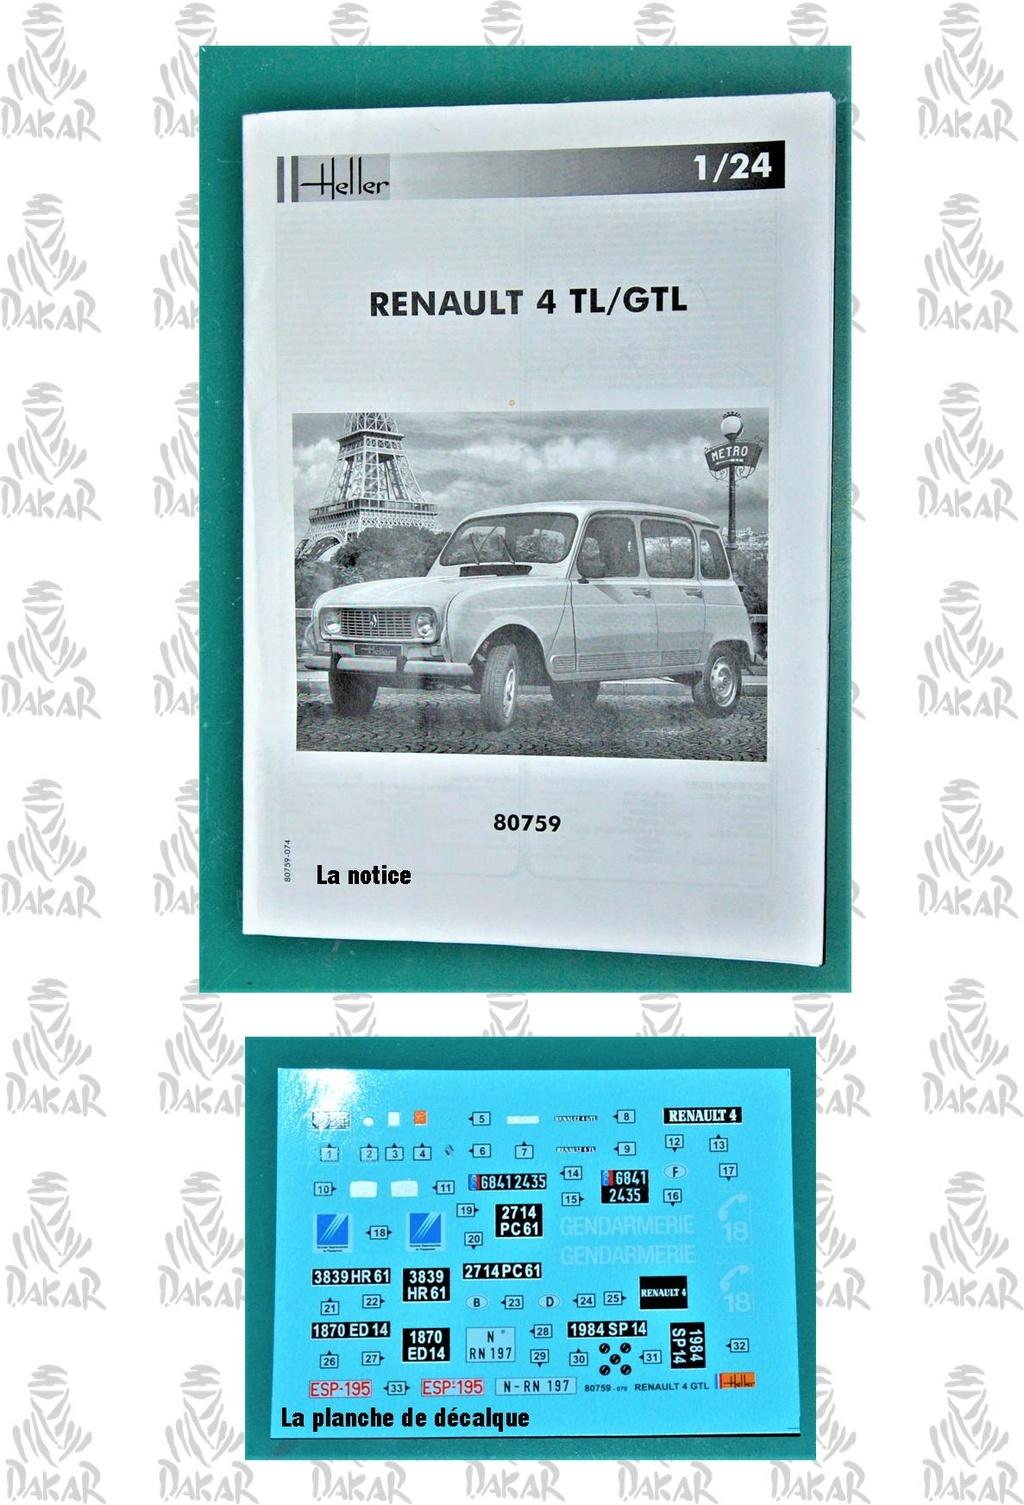 [1/24]Renault 4 l dakar 1980 Ref 80759 Image521